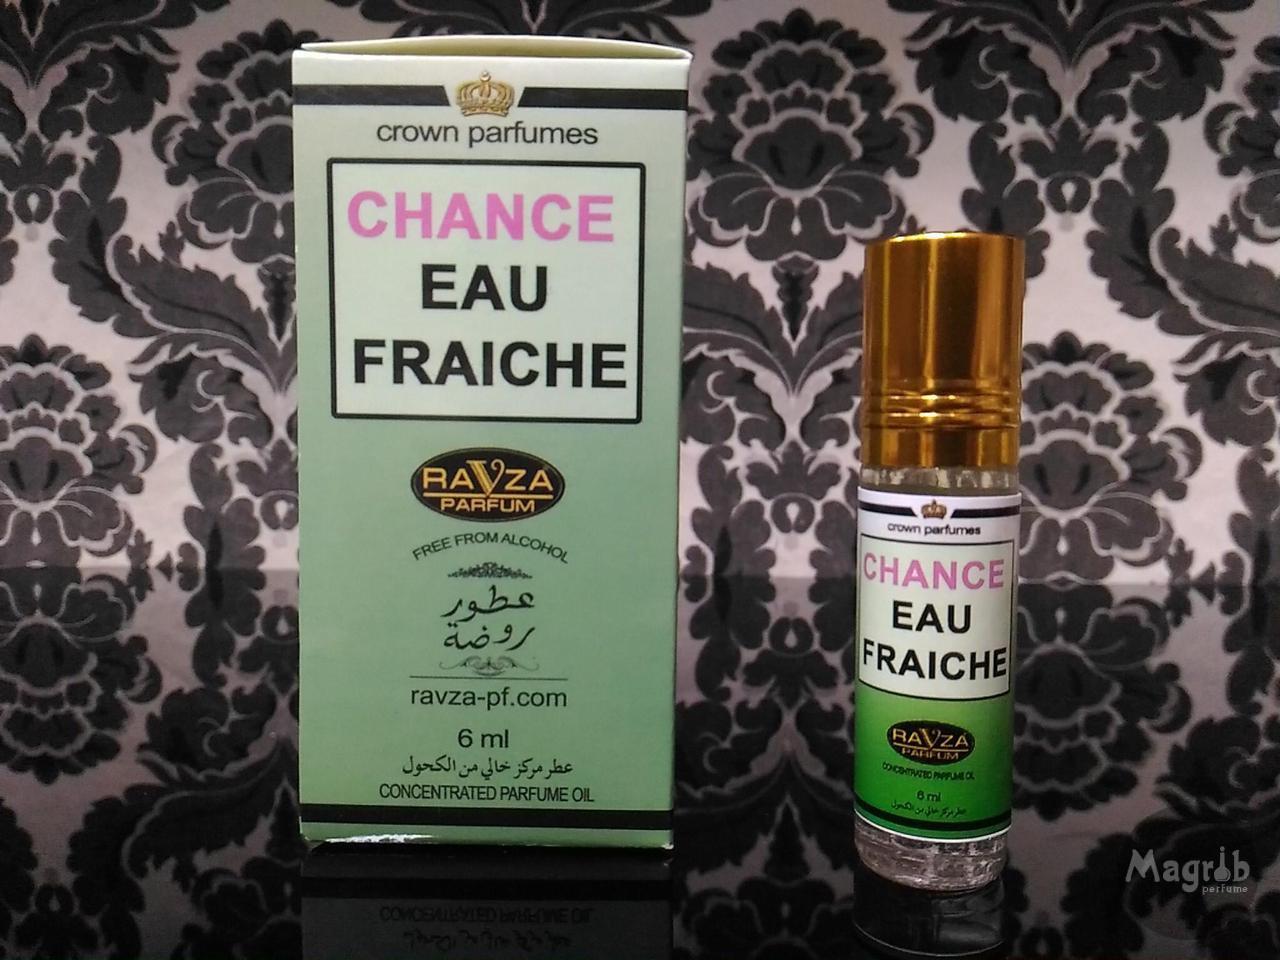 Ravza Chanel eau fraiche 6ml - женские масляные духи